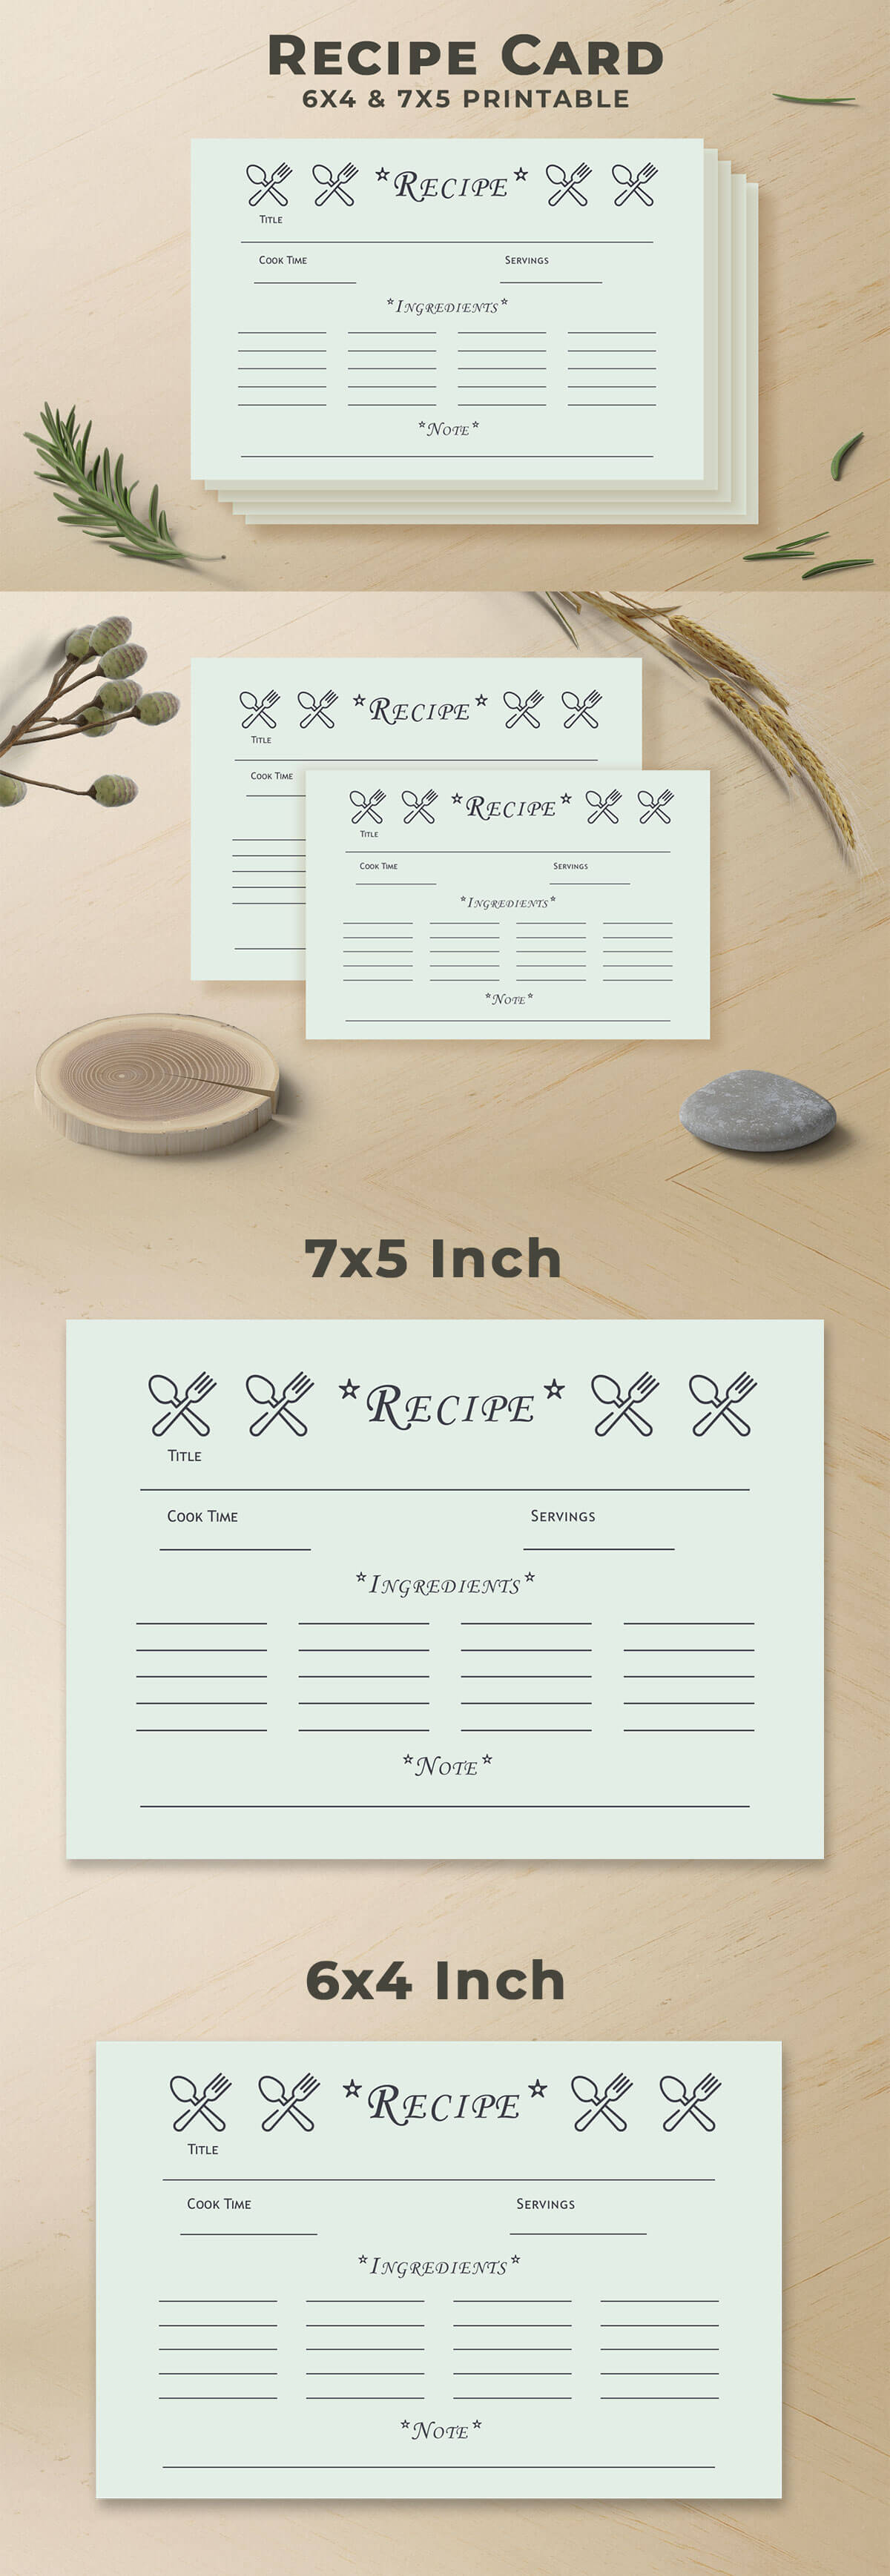 Free Recipe Card Printable Template V7